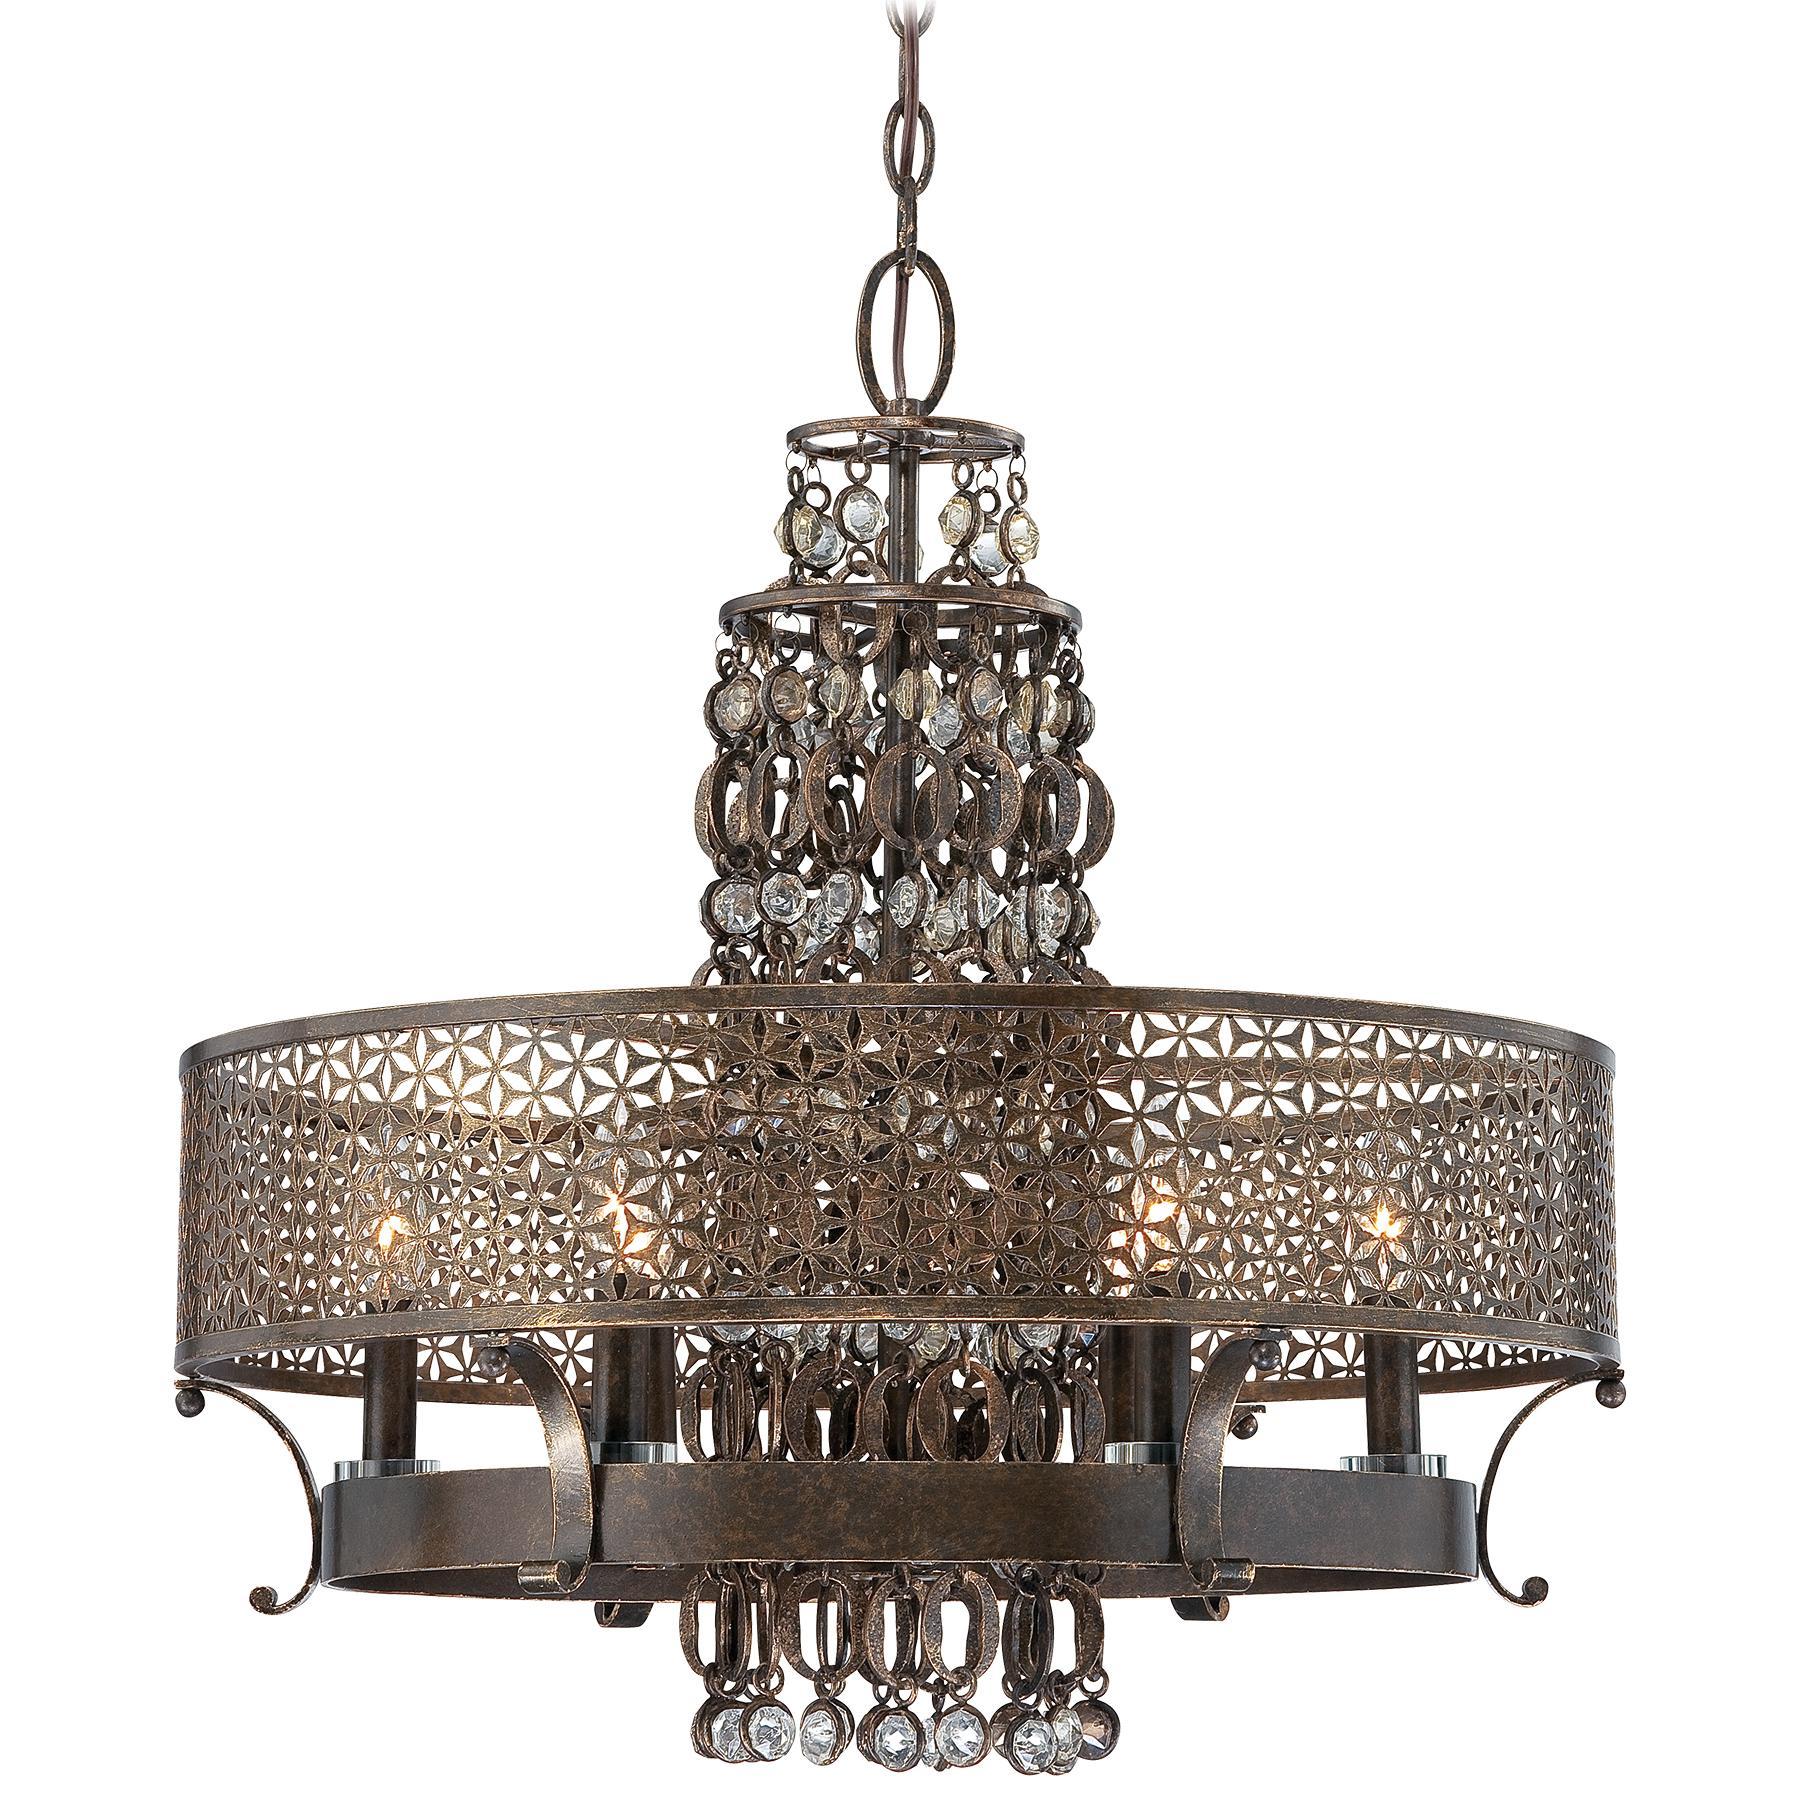 Ajourer chandelier by metropolitan lighting n6725 258 aloadofball Gallery